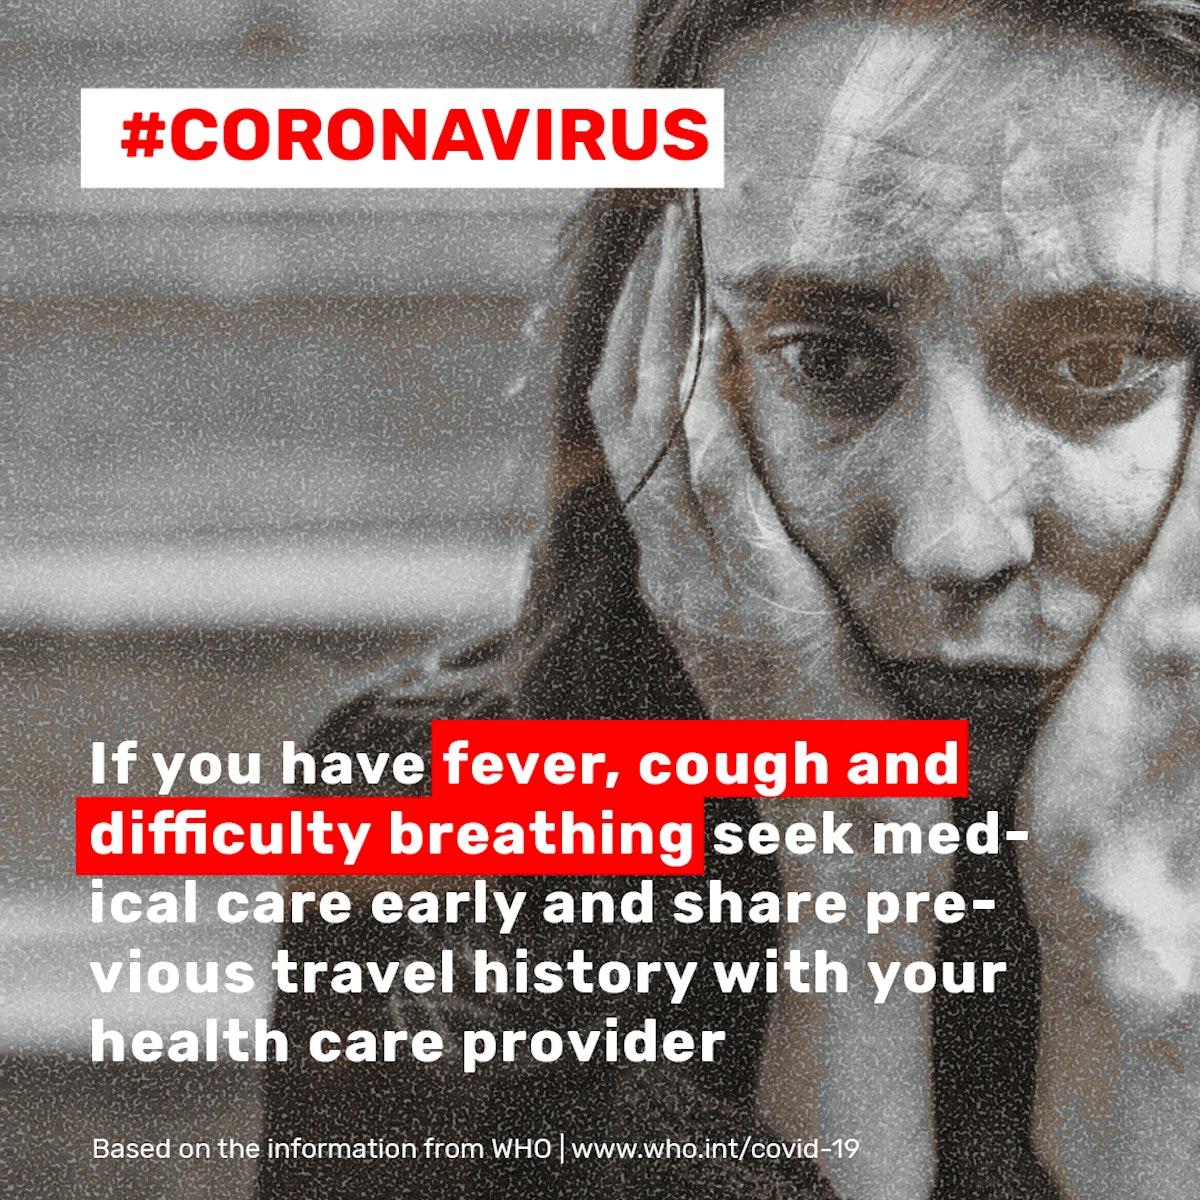 Coronavirus symptom advice social template source WHO